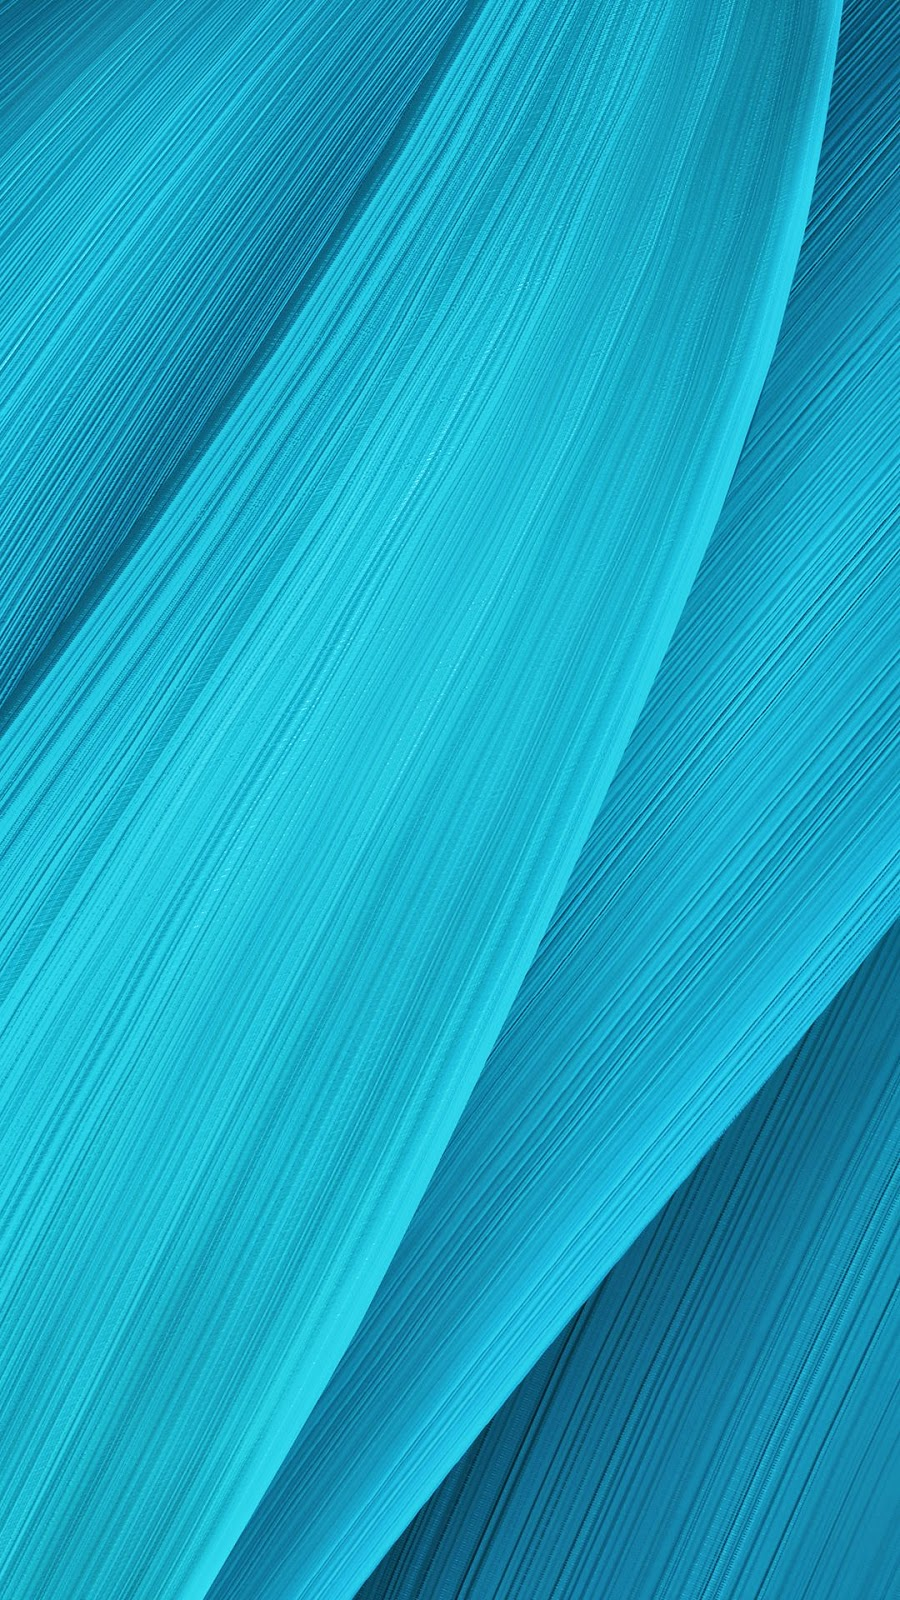 Water Drop Wallpaper For Iphone แจก Wallpaper จาก Asus Zenfone 2 แบบความละเอียดสูง ไว้ใช้